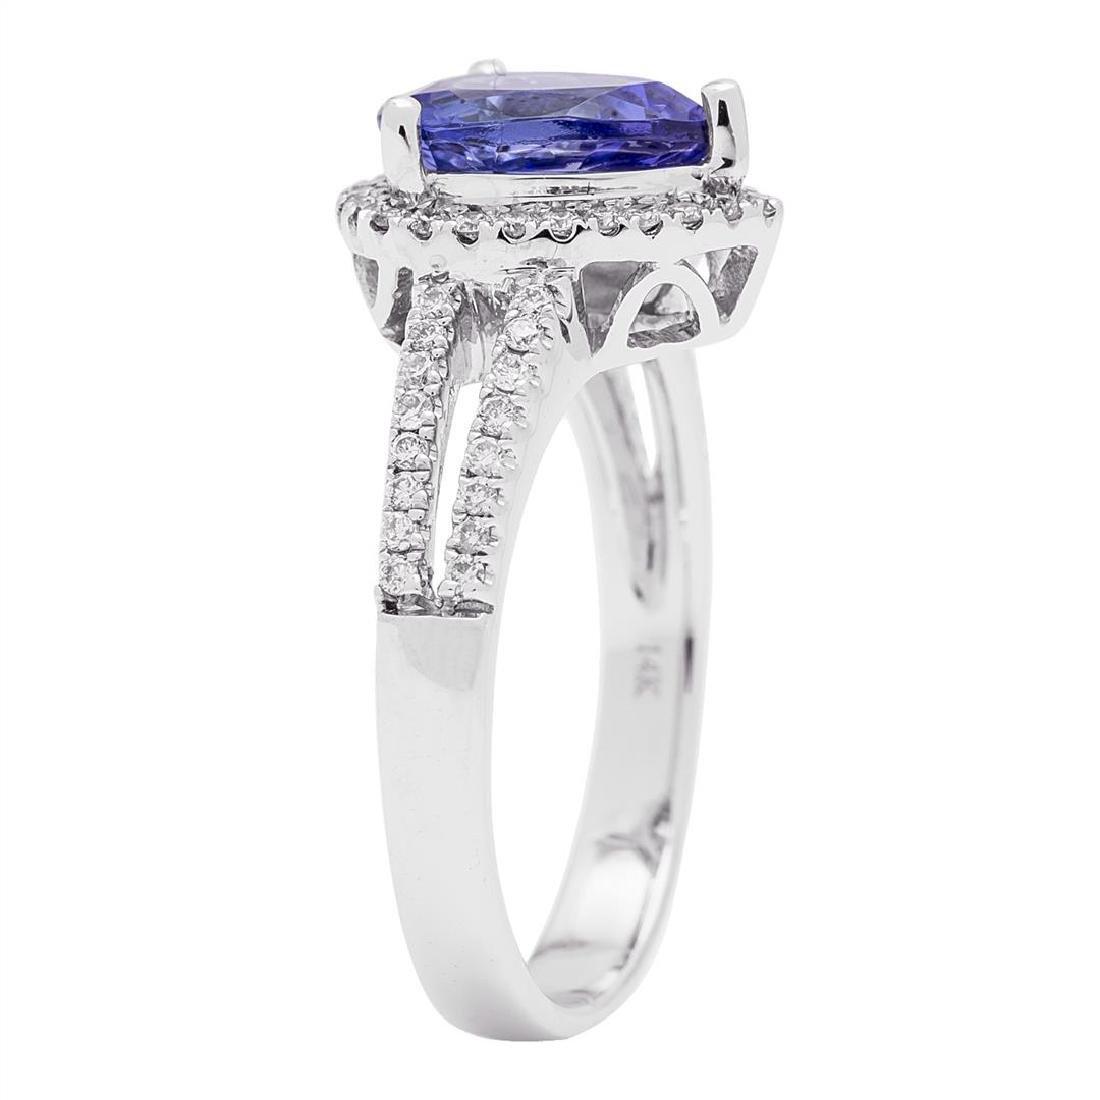 1.93 ctw Tanzanite and Diamond Ring - 14KT White Gold - 3